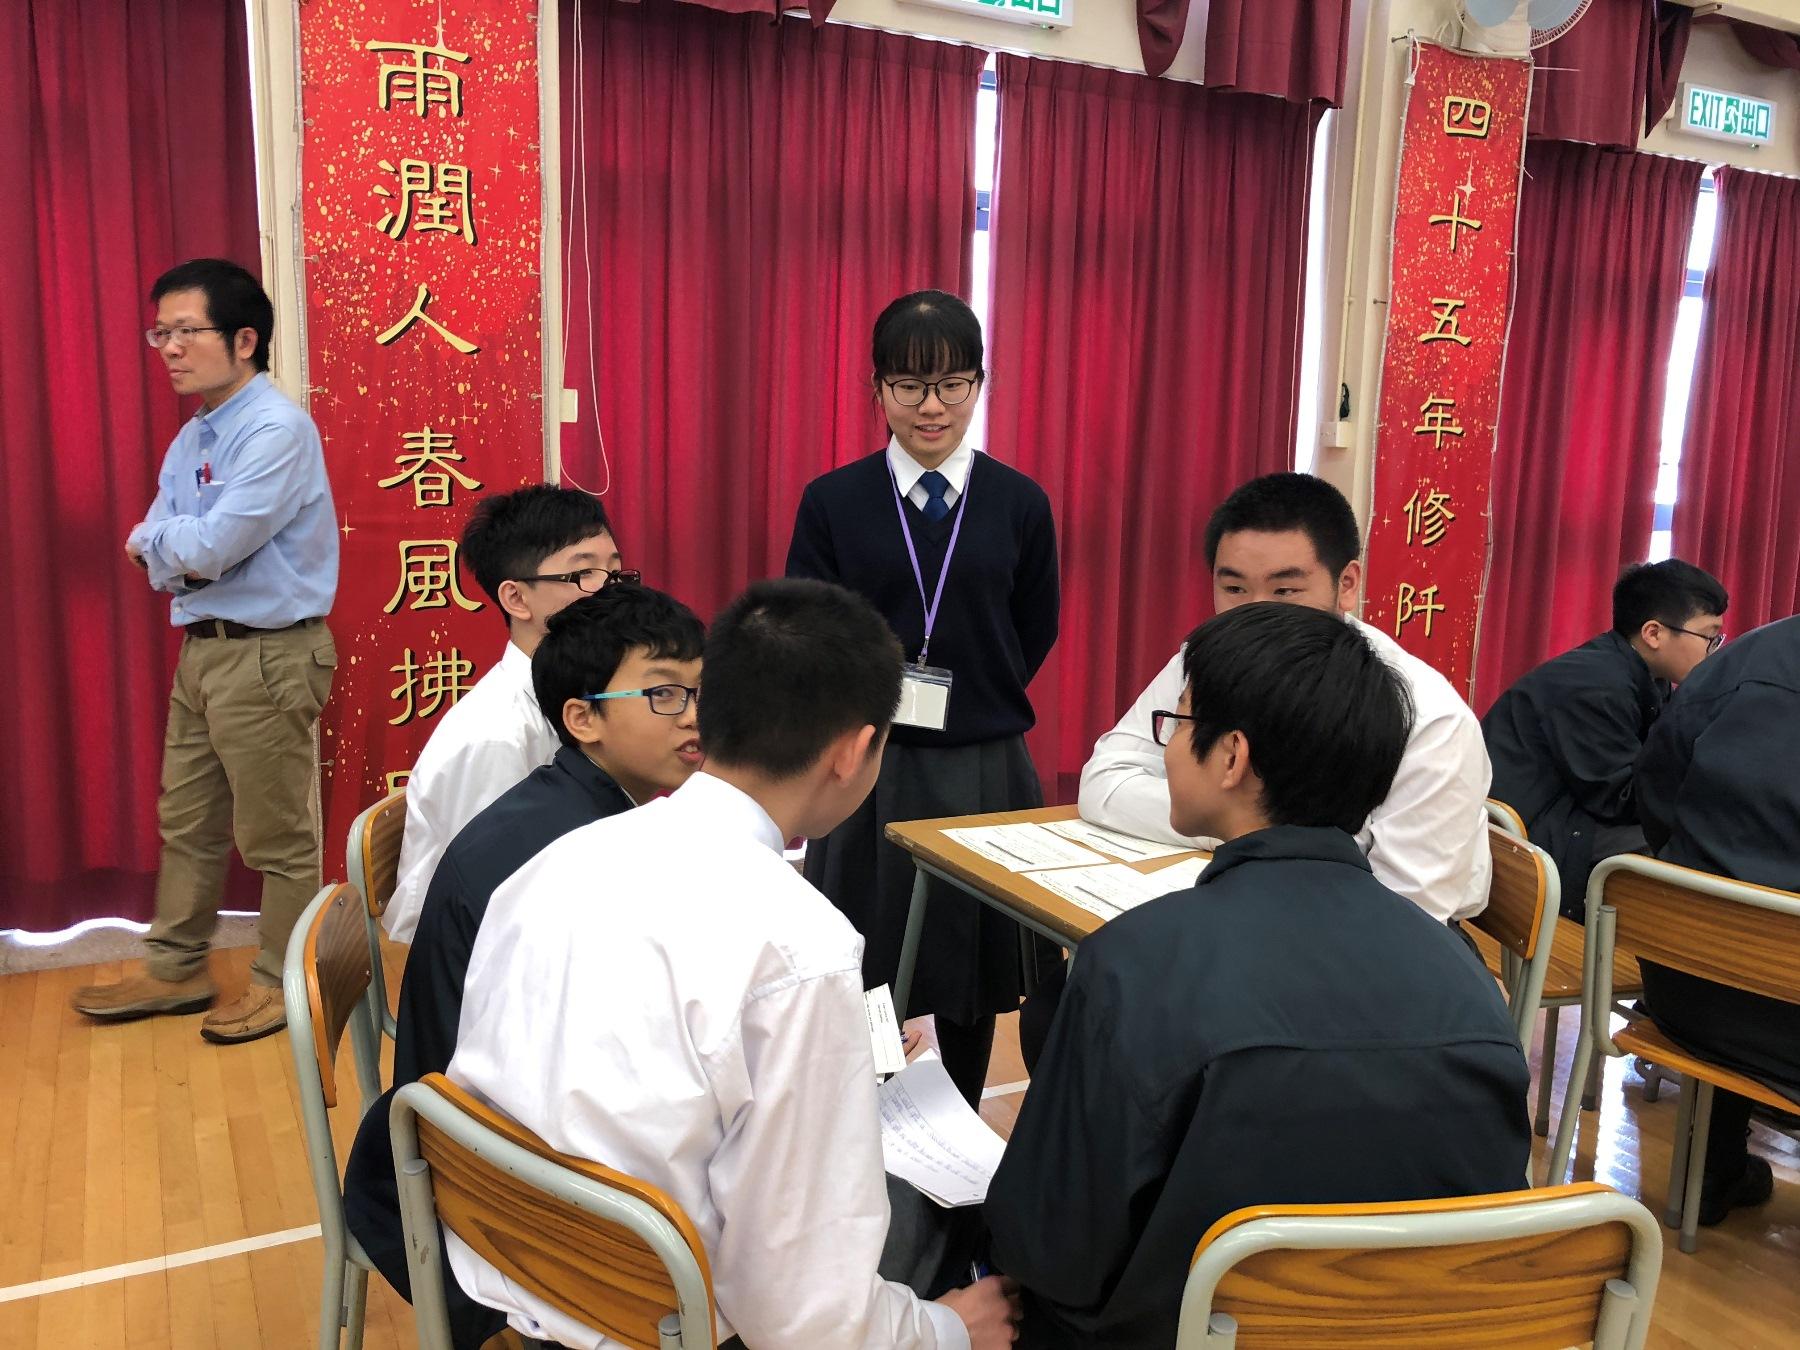 http://npc.edu.hk/sites/default/files/img_0764.jpg